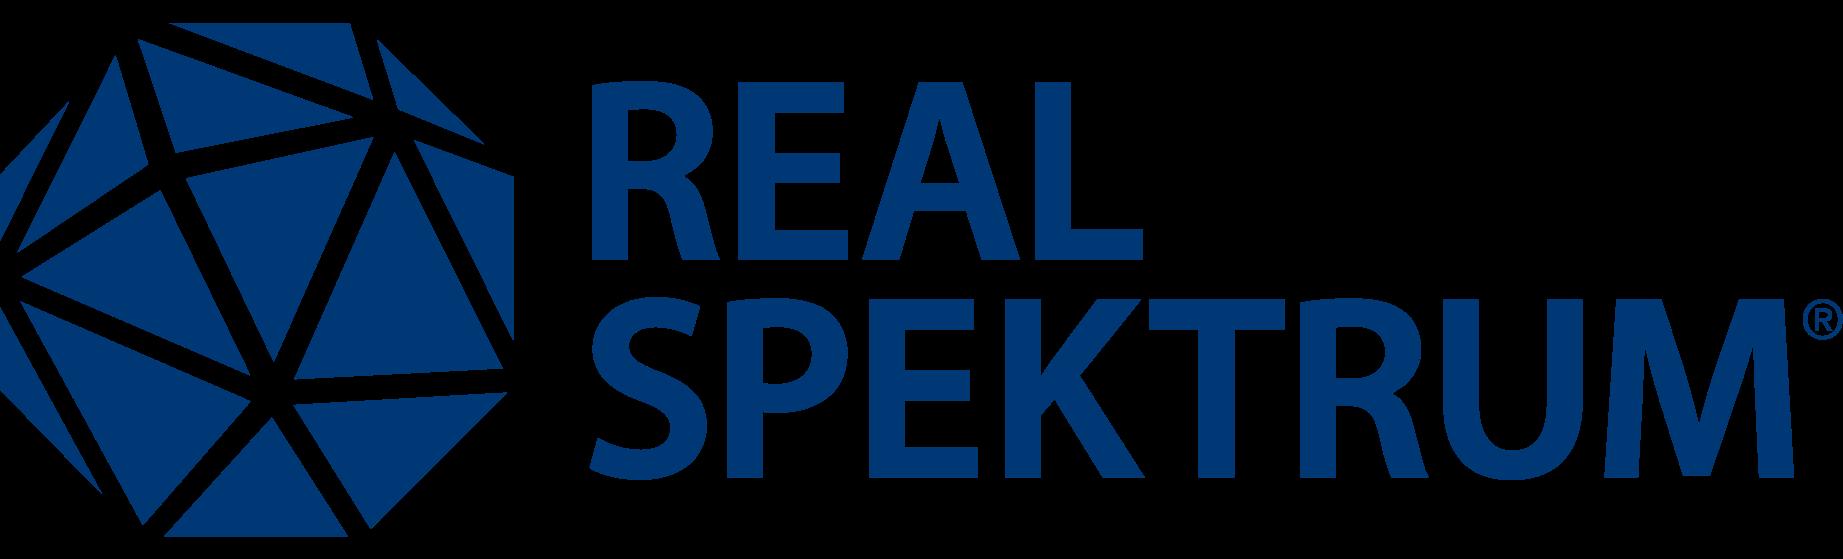 REAL SPEKTRUM